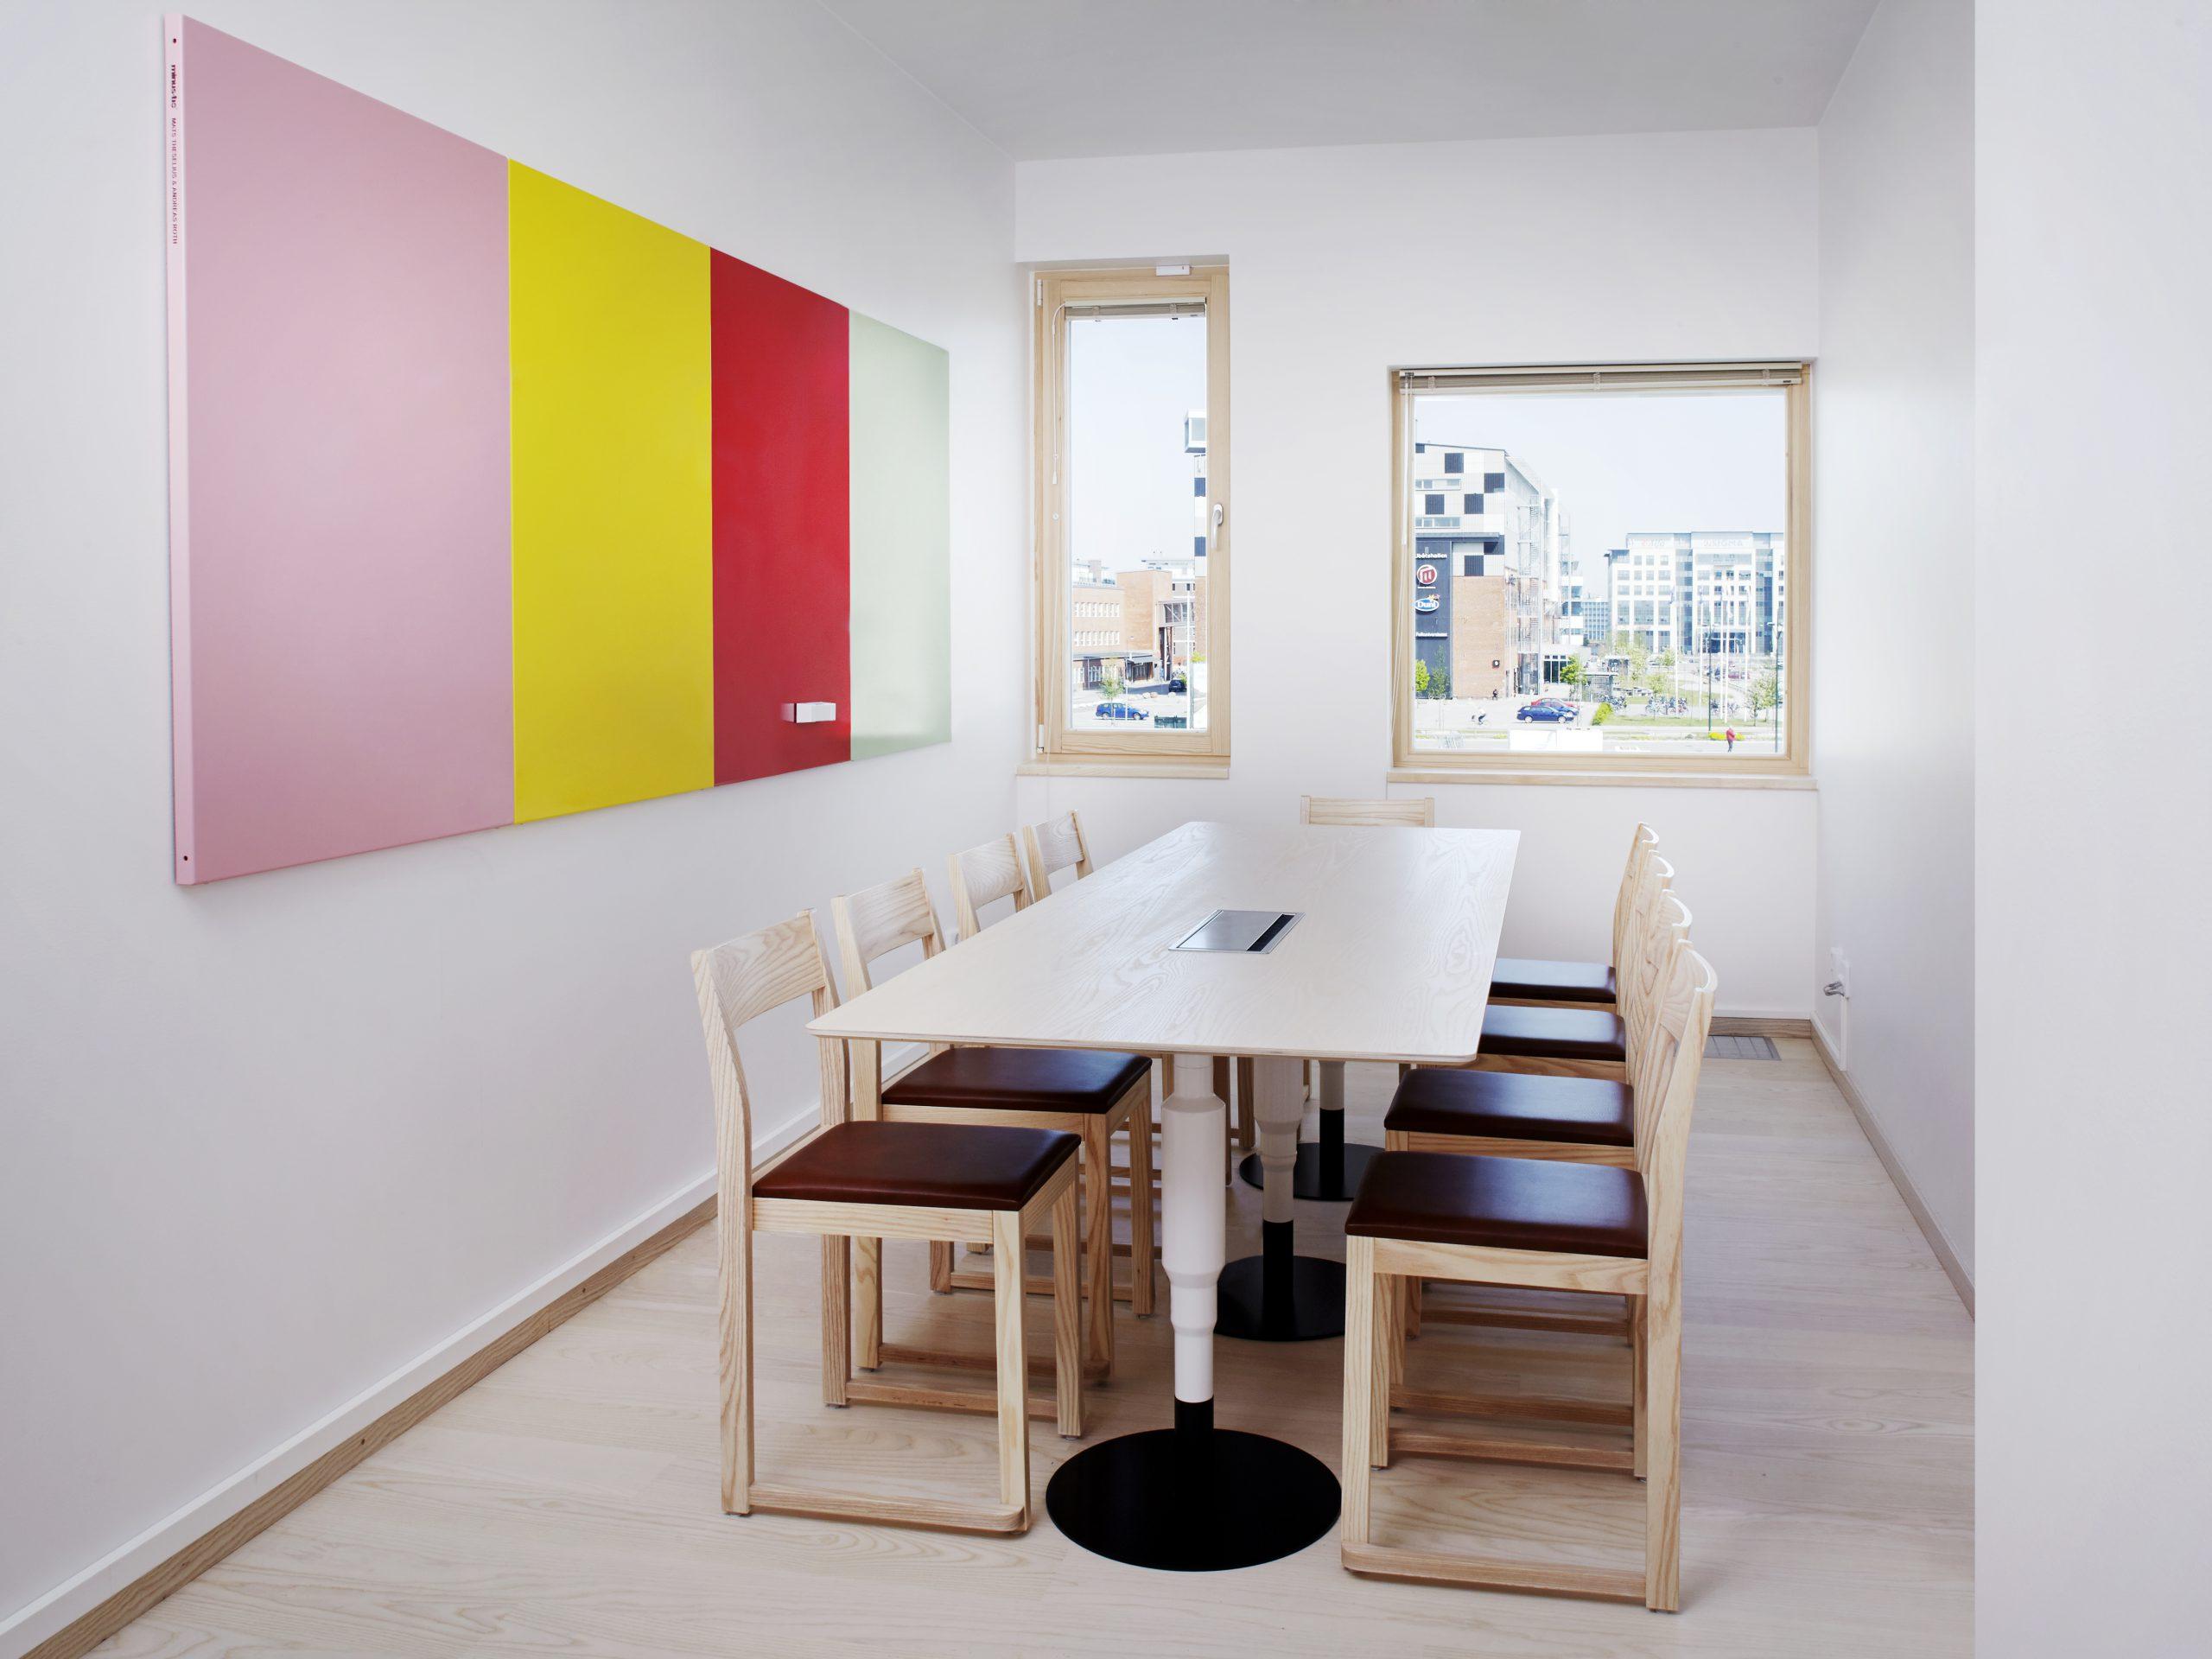 https://www.minustio.se/wp-content/uploads/2021/03/Minus-tio-Cosmos-X-table-Slim-One-chairs-Eon-1600x900.jpg